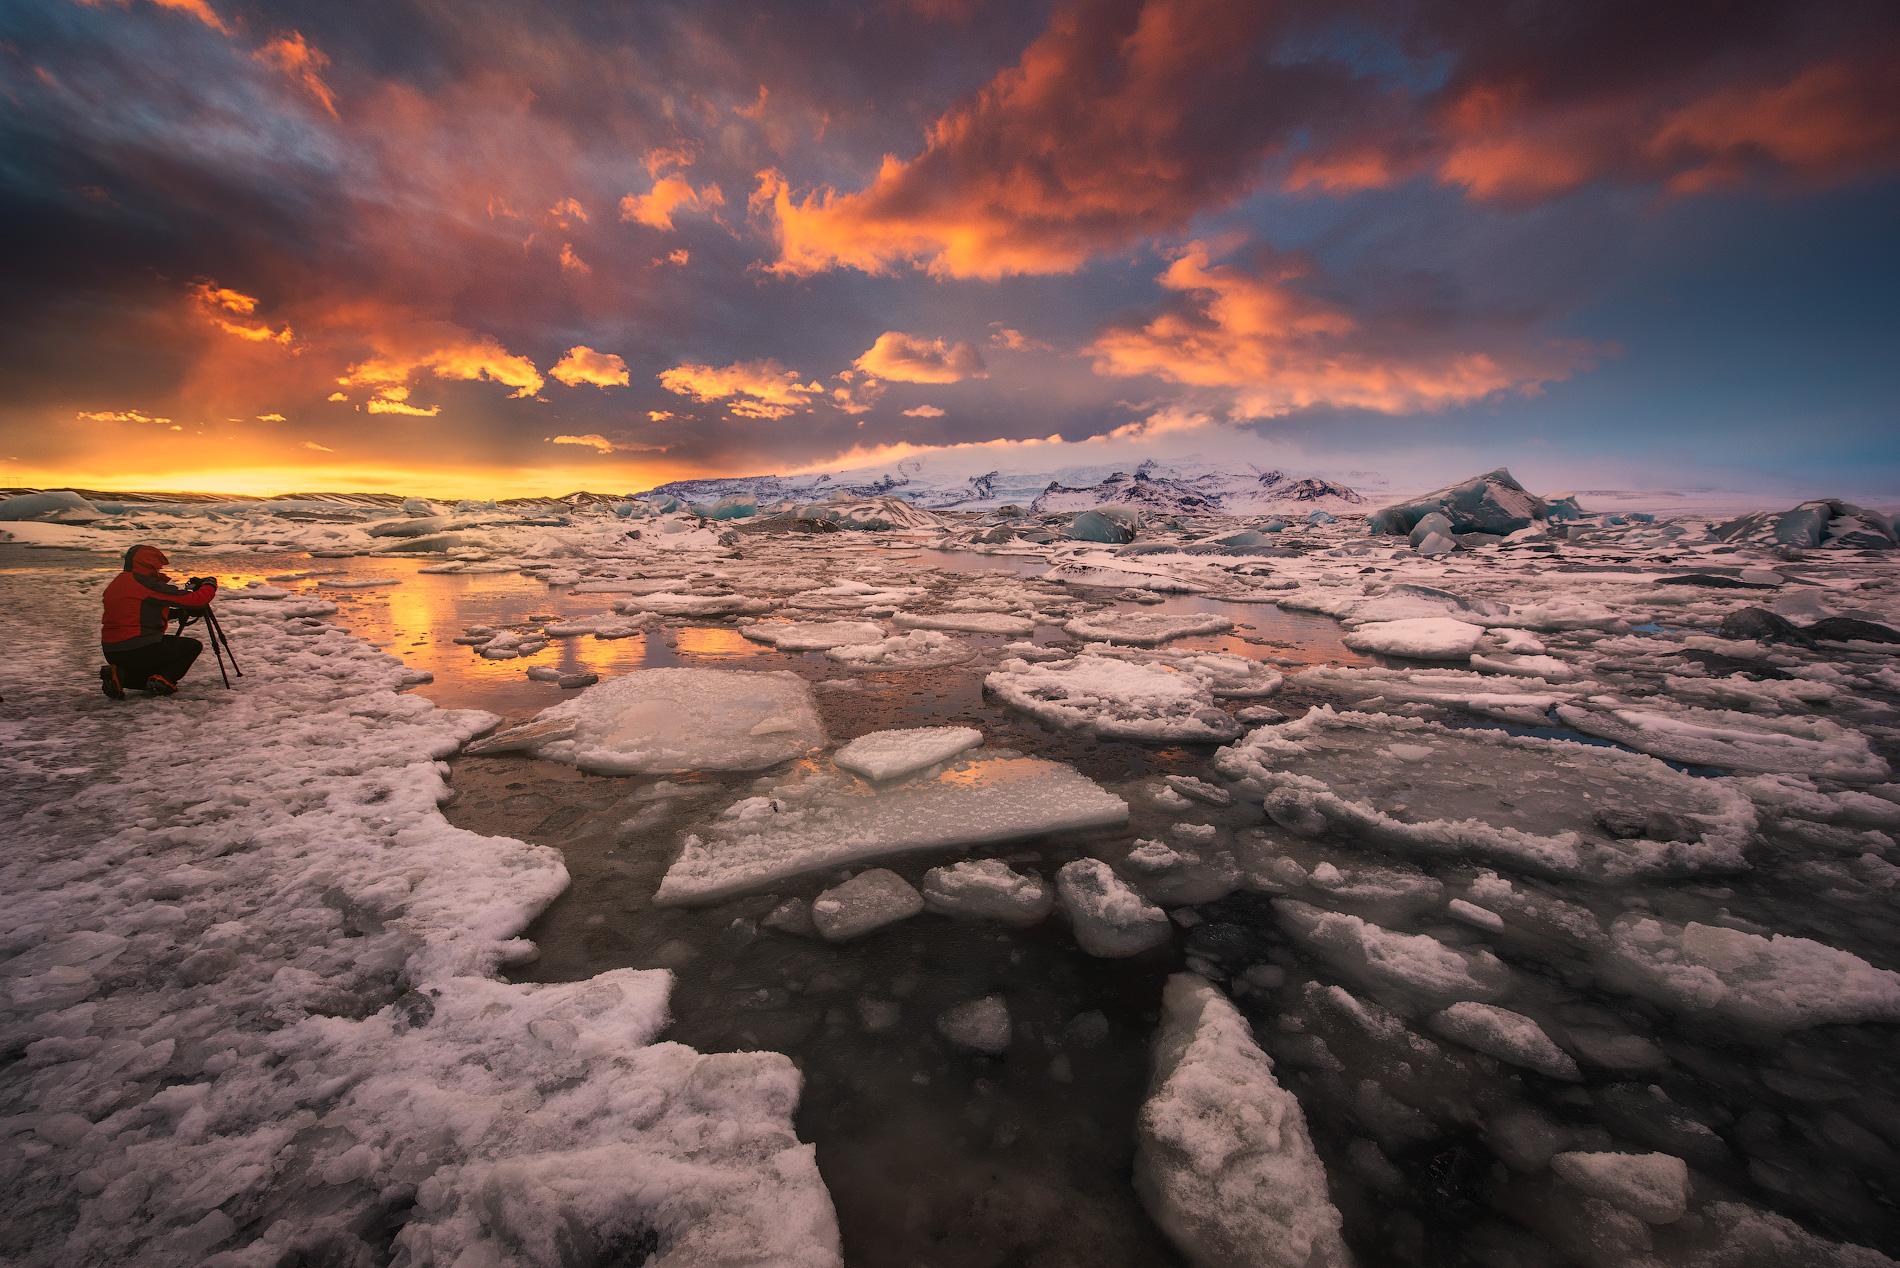 Golden Hour, the perfect photography time at Jökulsárlón glacier lagoon.